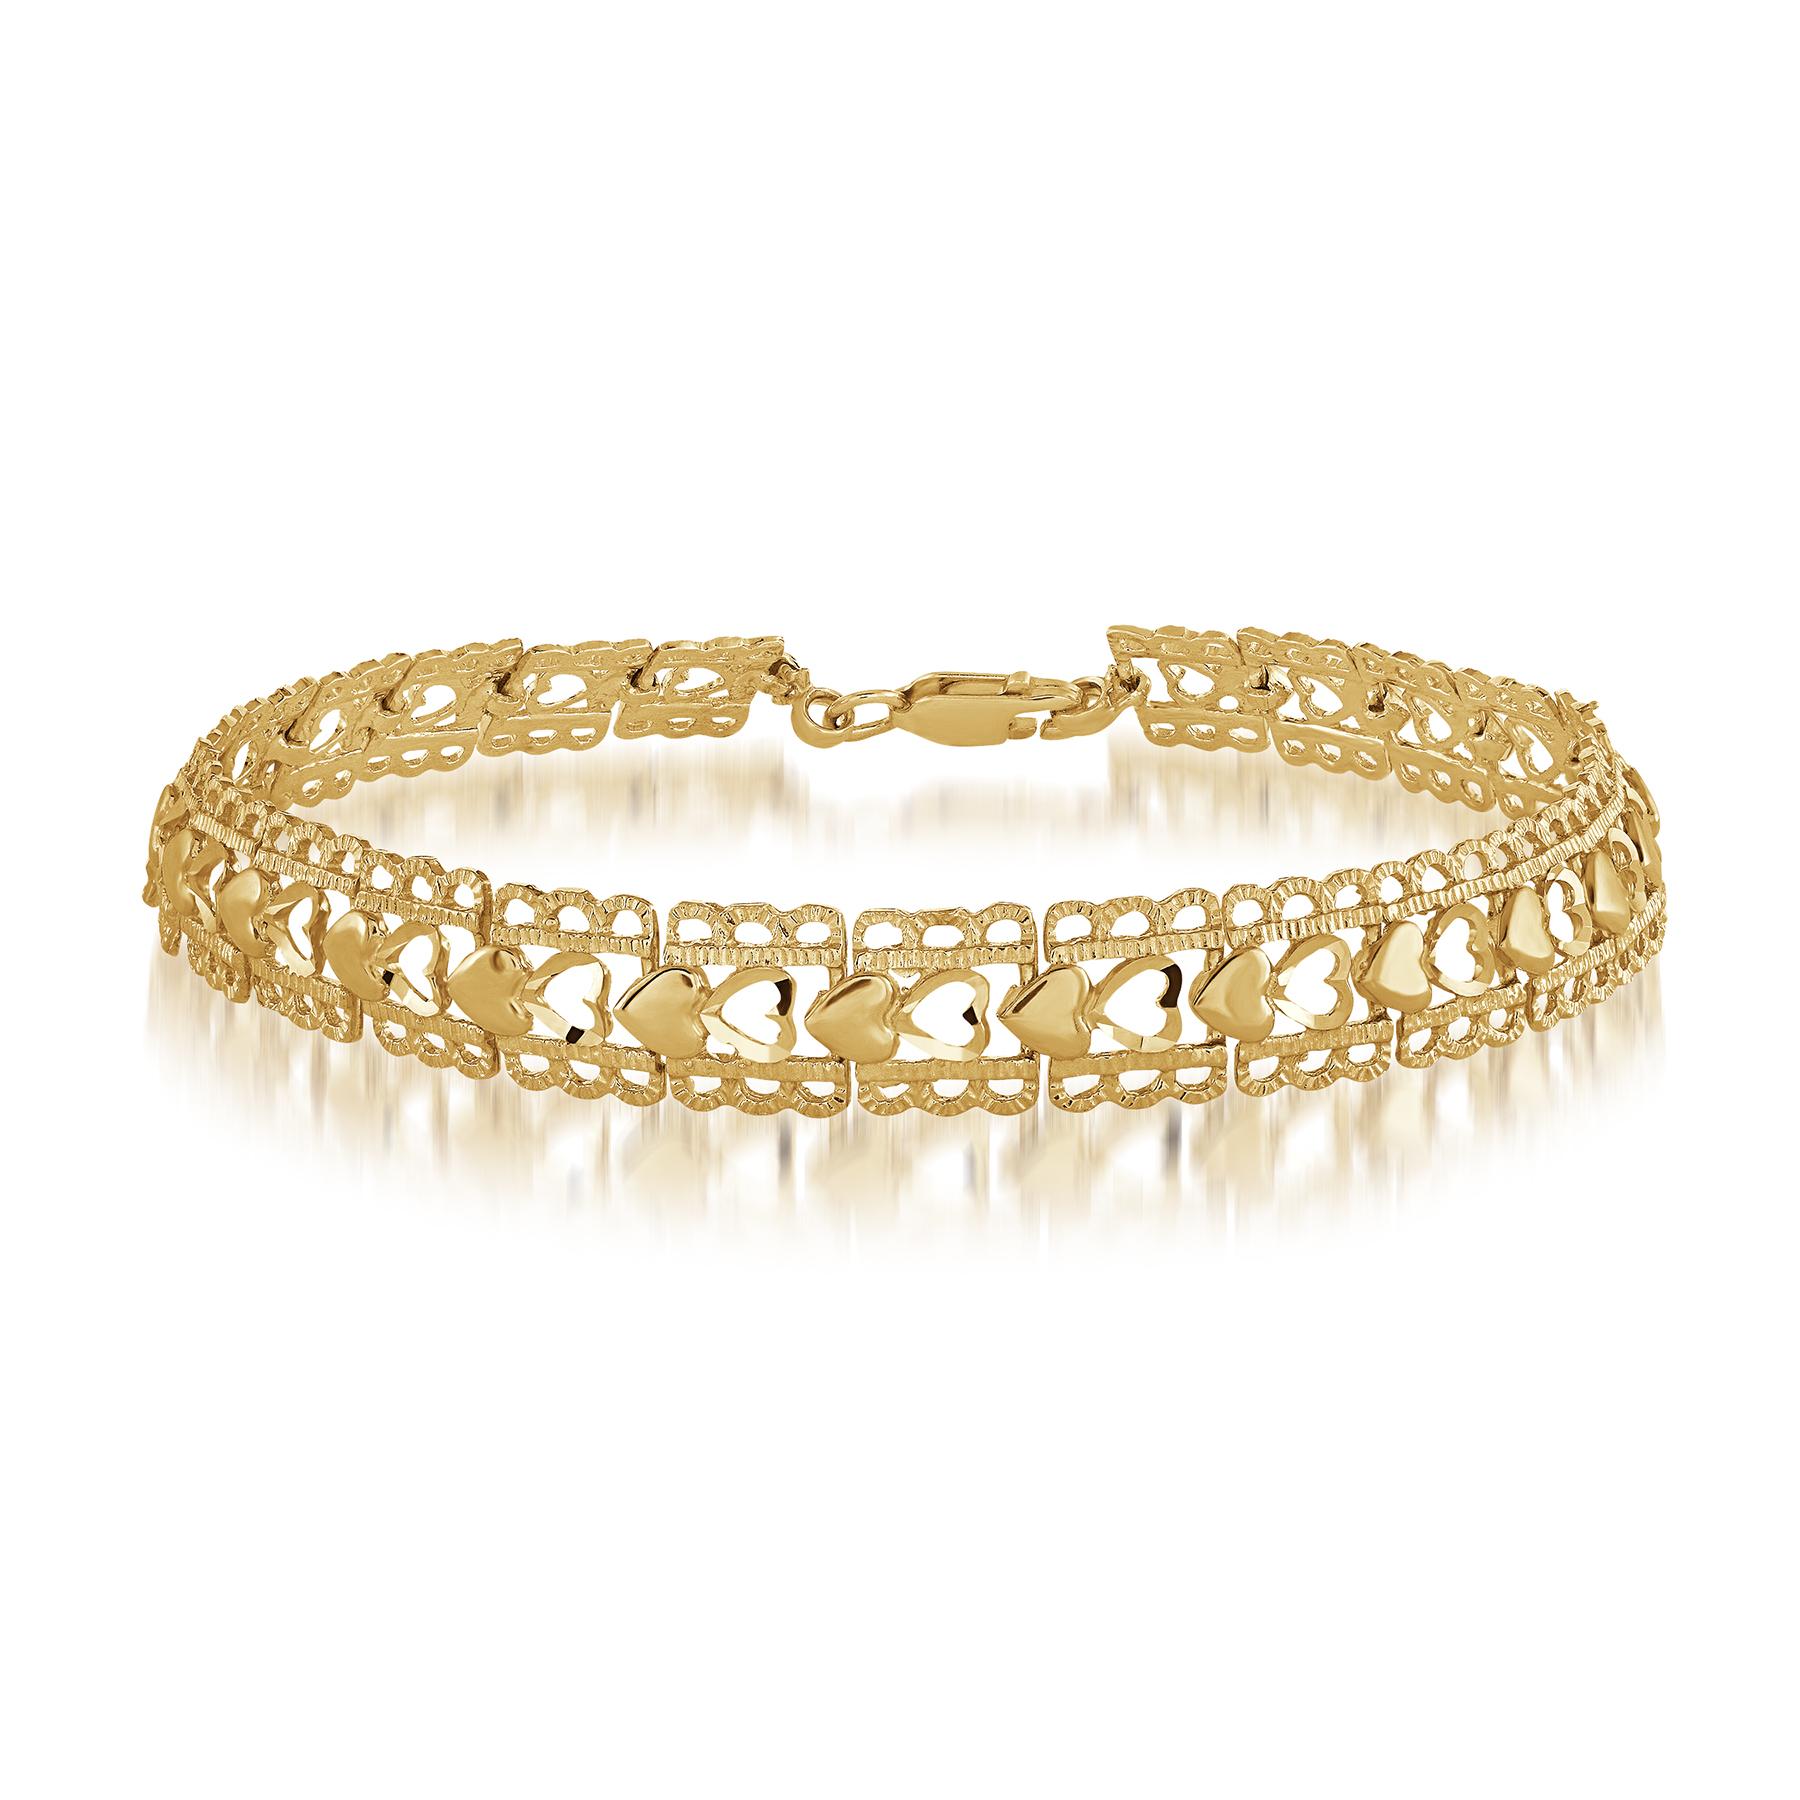 Heart bracelet for woman - 10K yellow gold